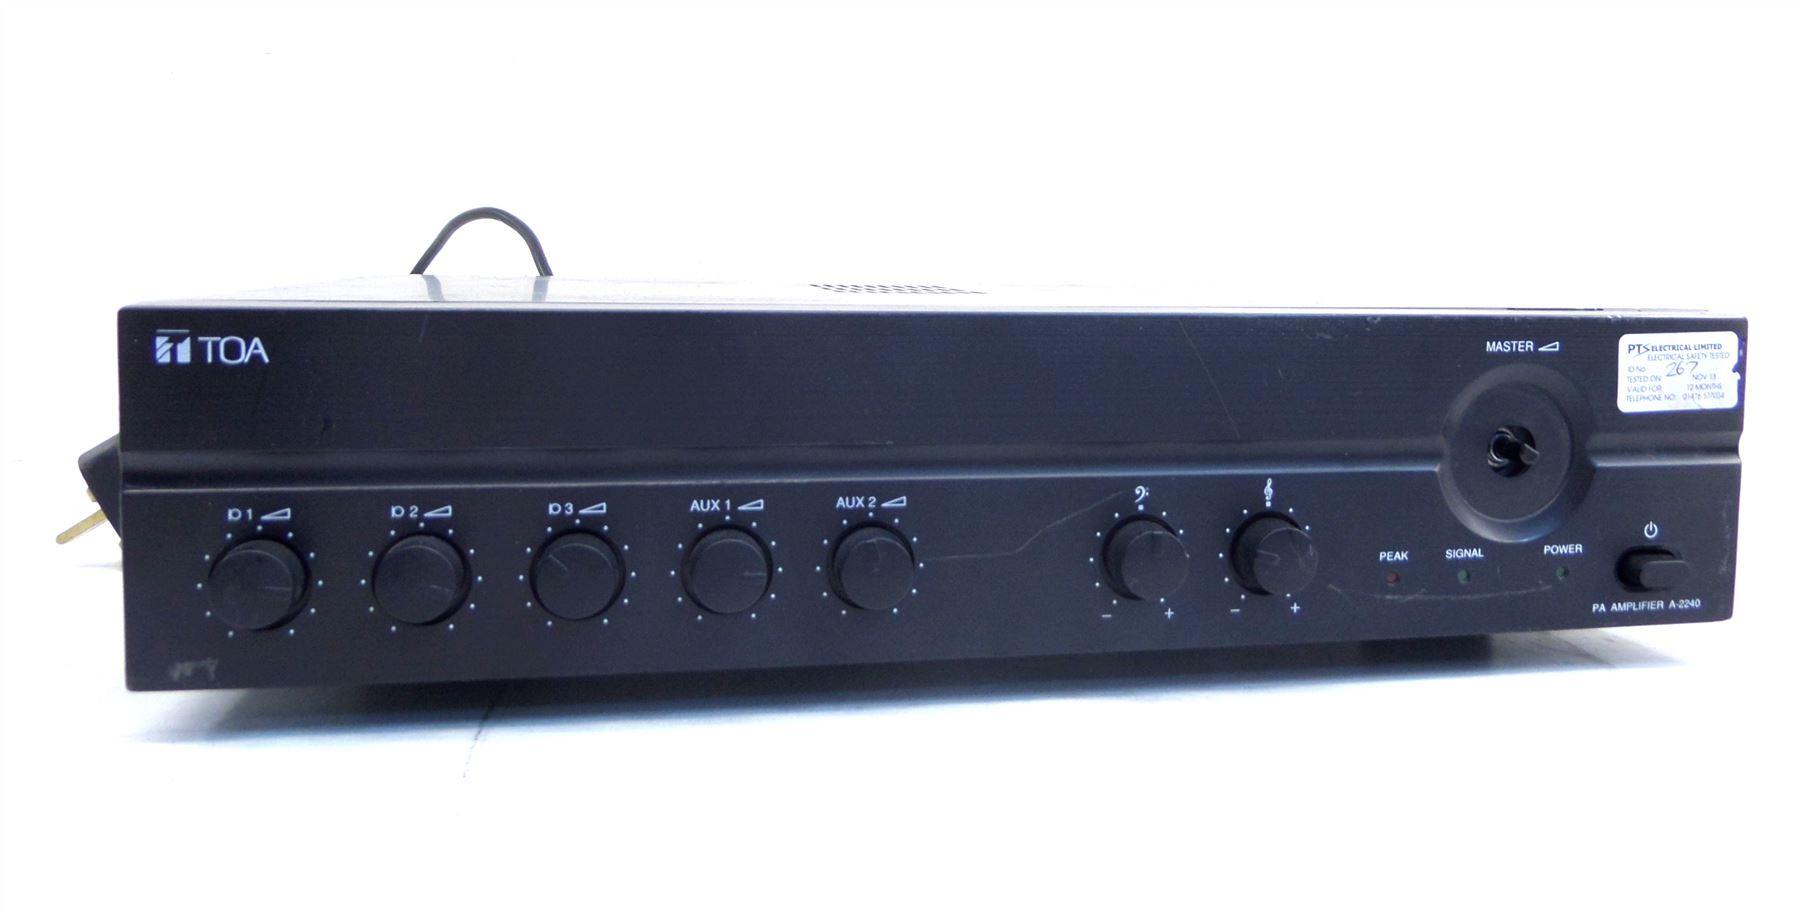 toa a 2240 240w electronics mixer amplifier 100v balanced mic inputs ebay. Black Bedroom Furniture Sets. Home Design Ideas